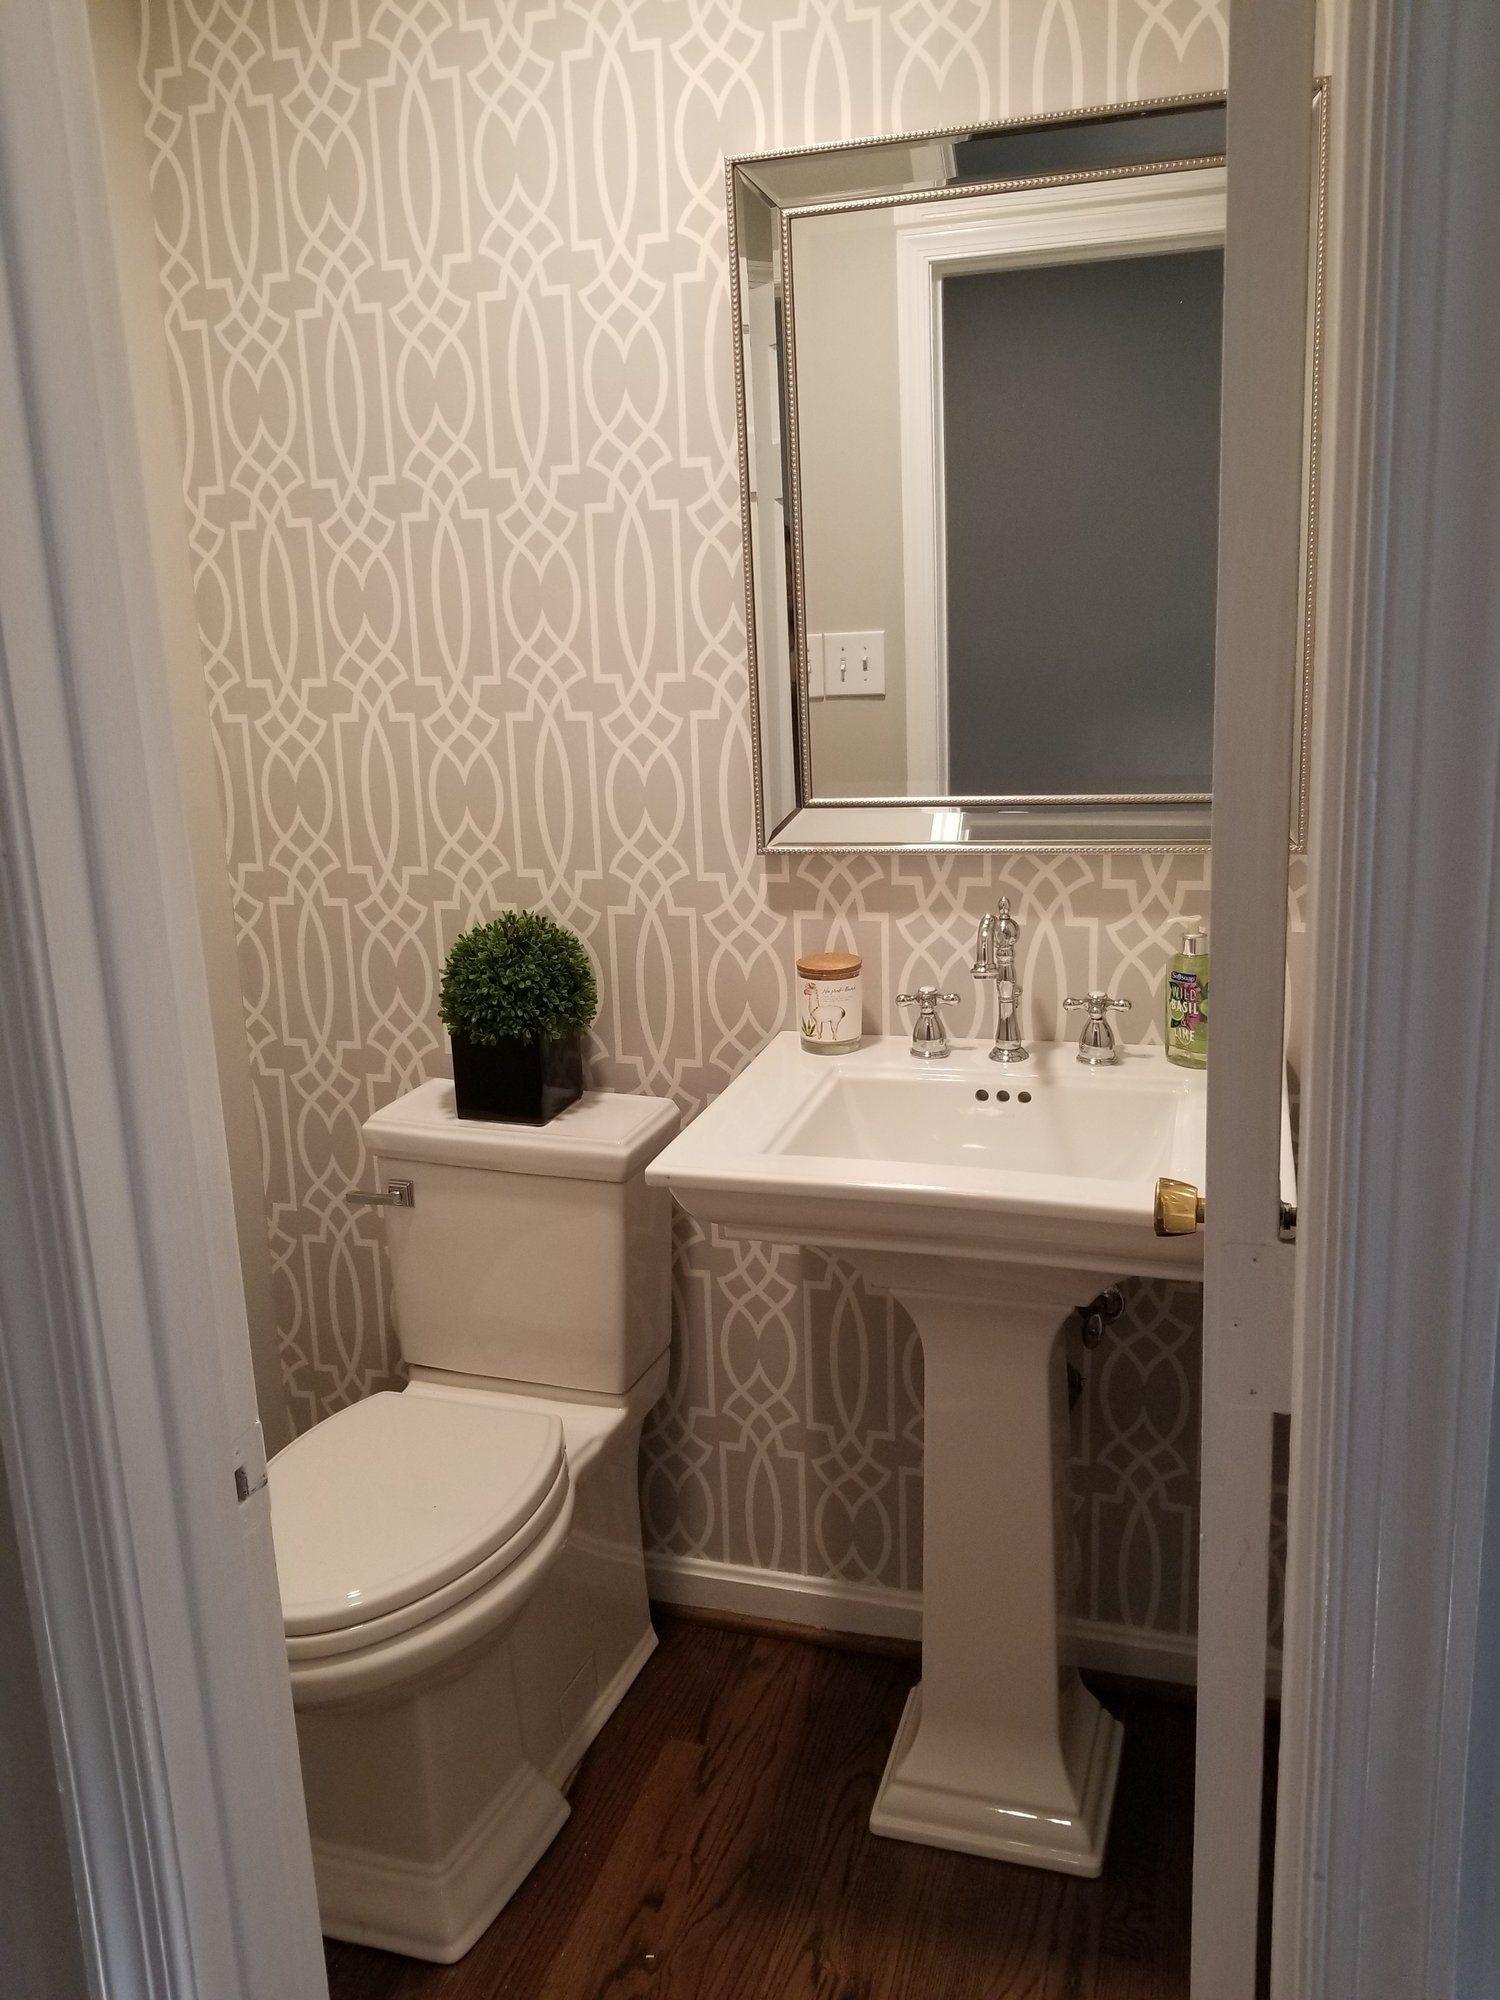 Updated Half Bath With Wallpaper Square Pedestal Sink Cross